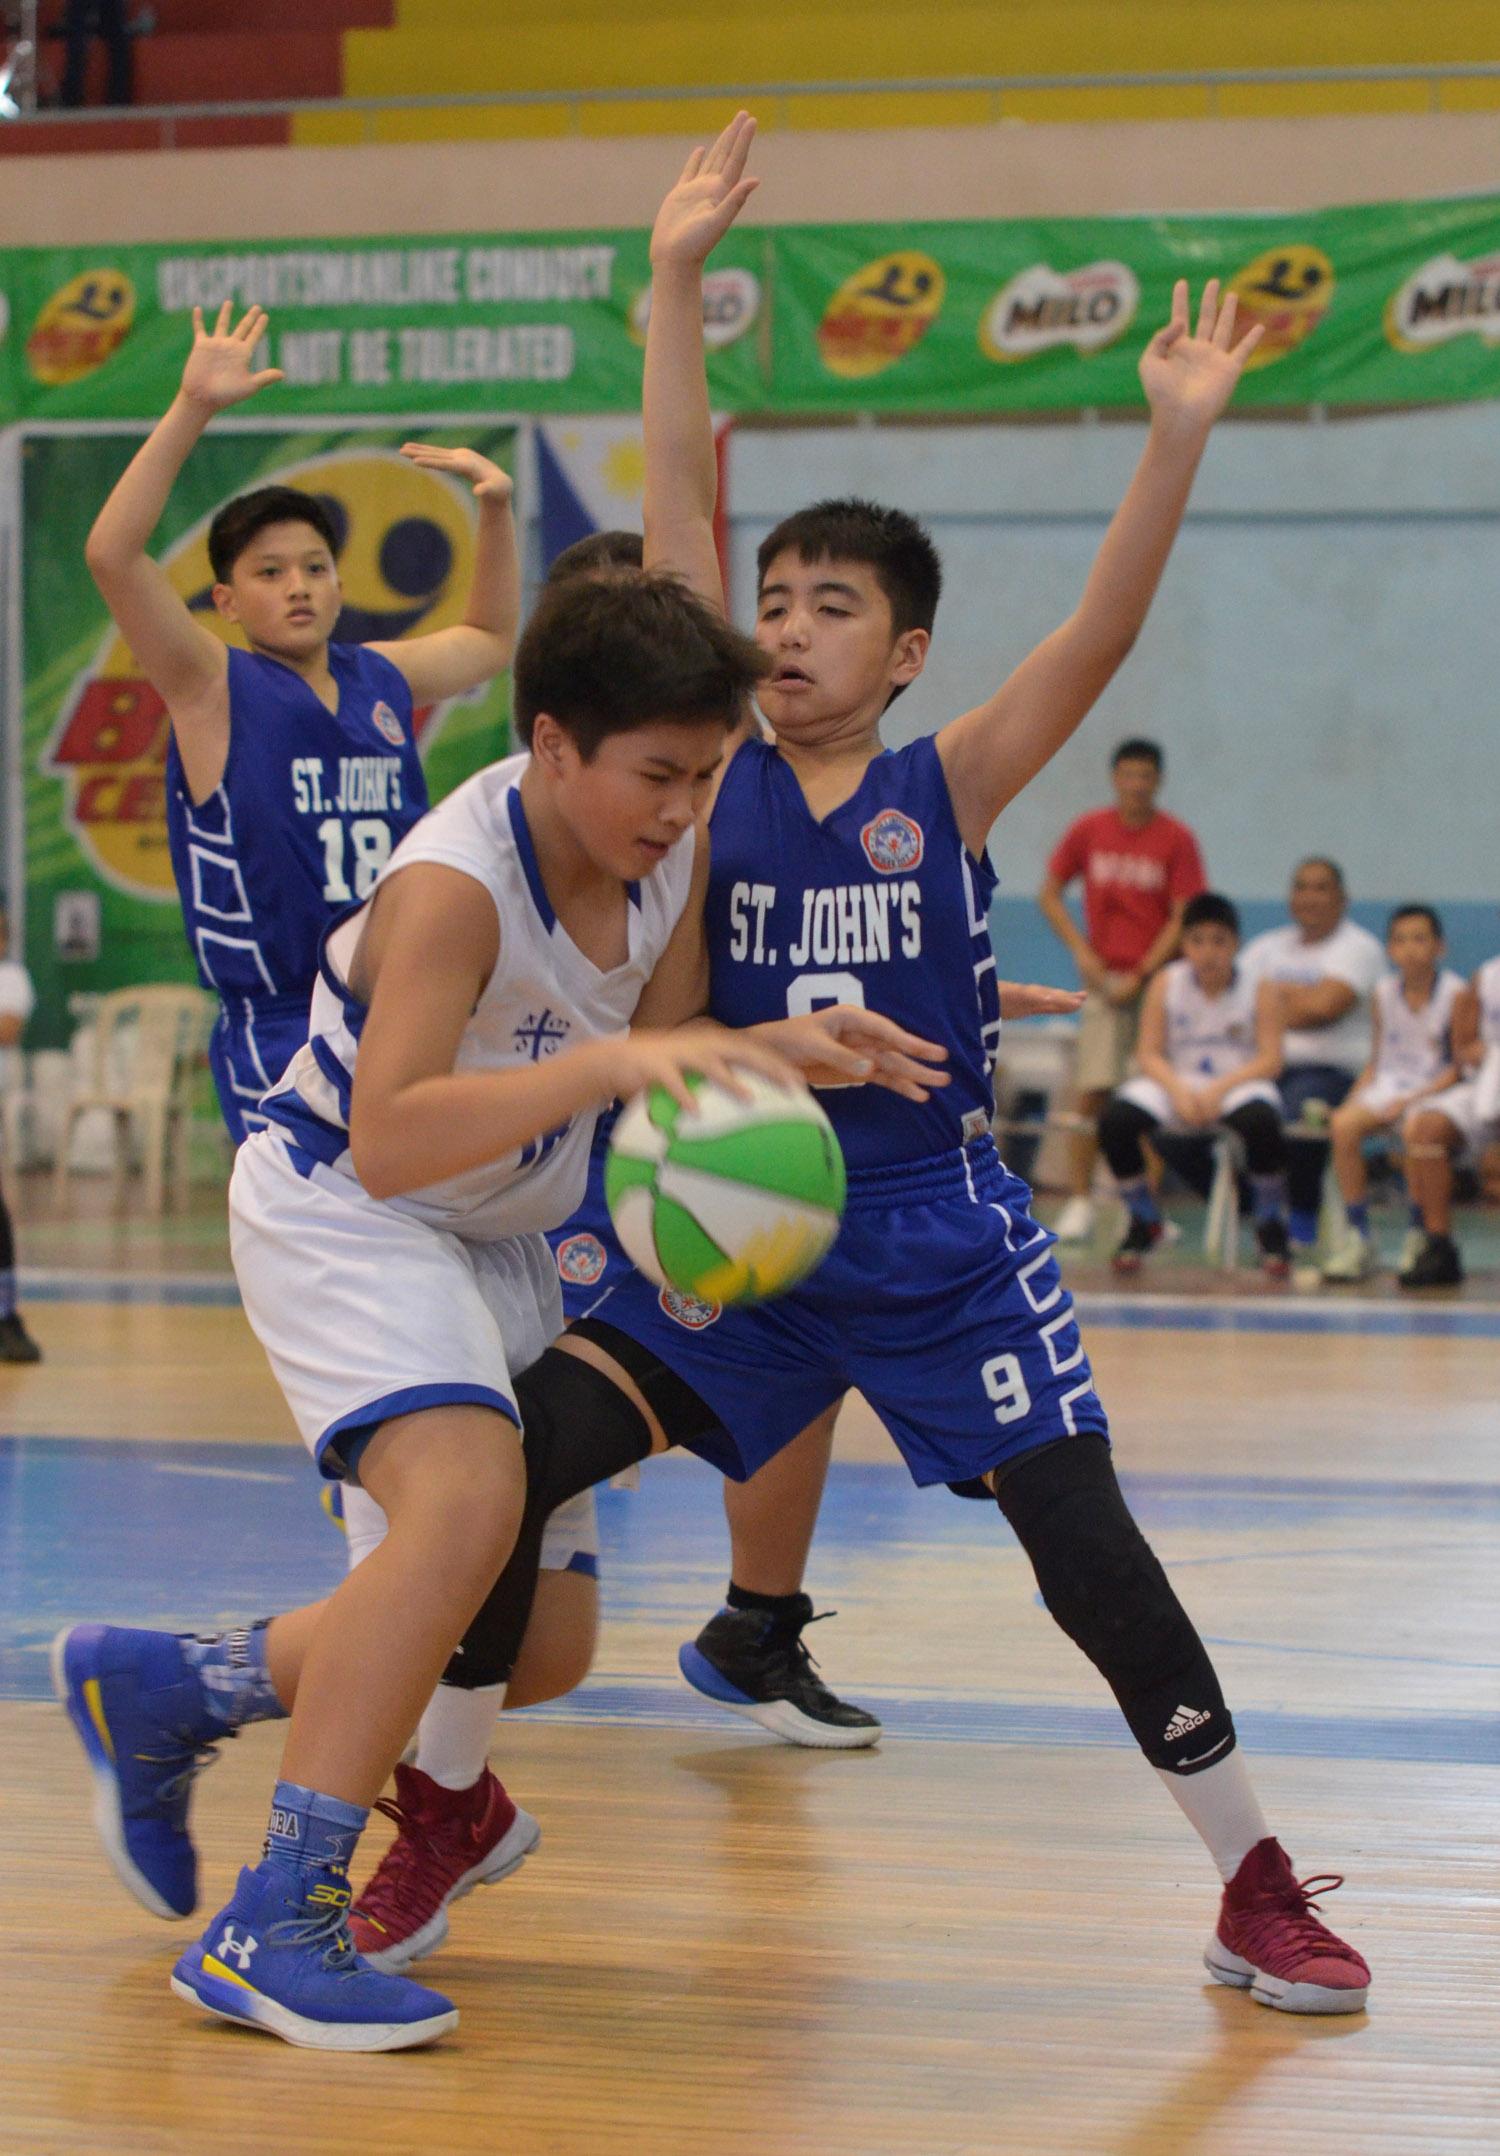 SHS-Ateneo, Hua Siong College of Iloilo advance to finals